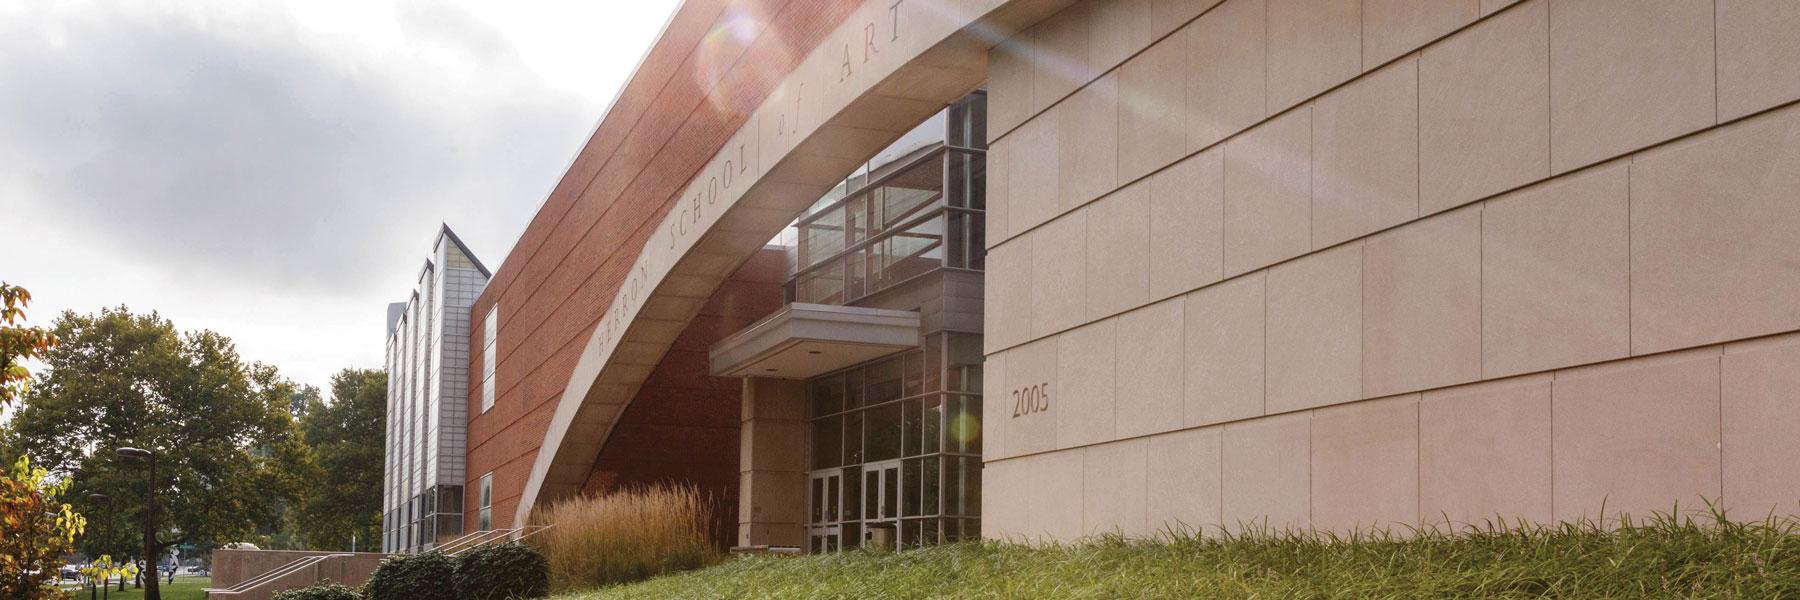 open house herron of art design indiana university